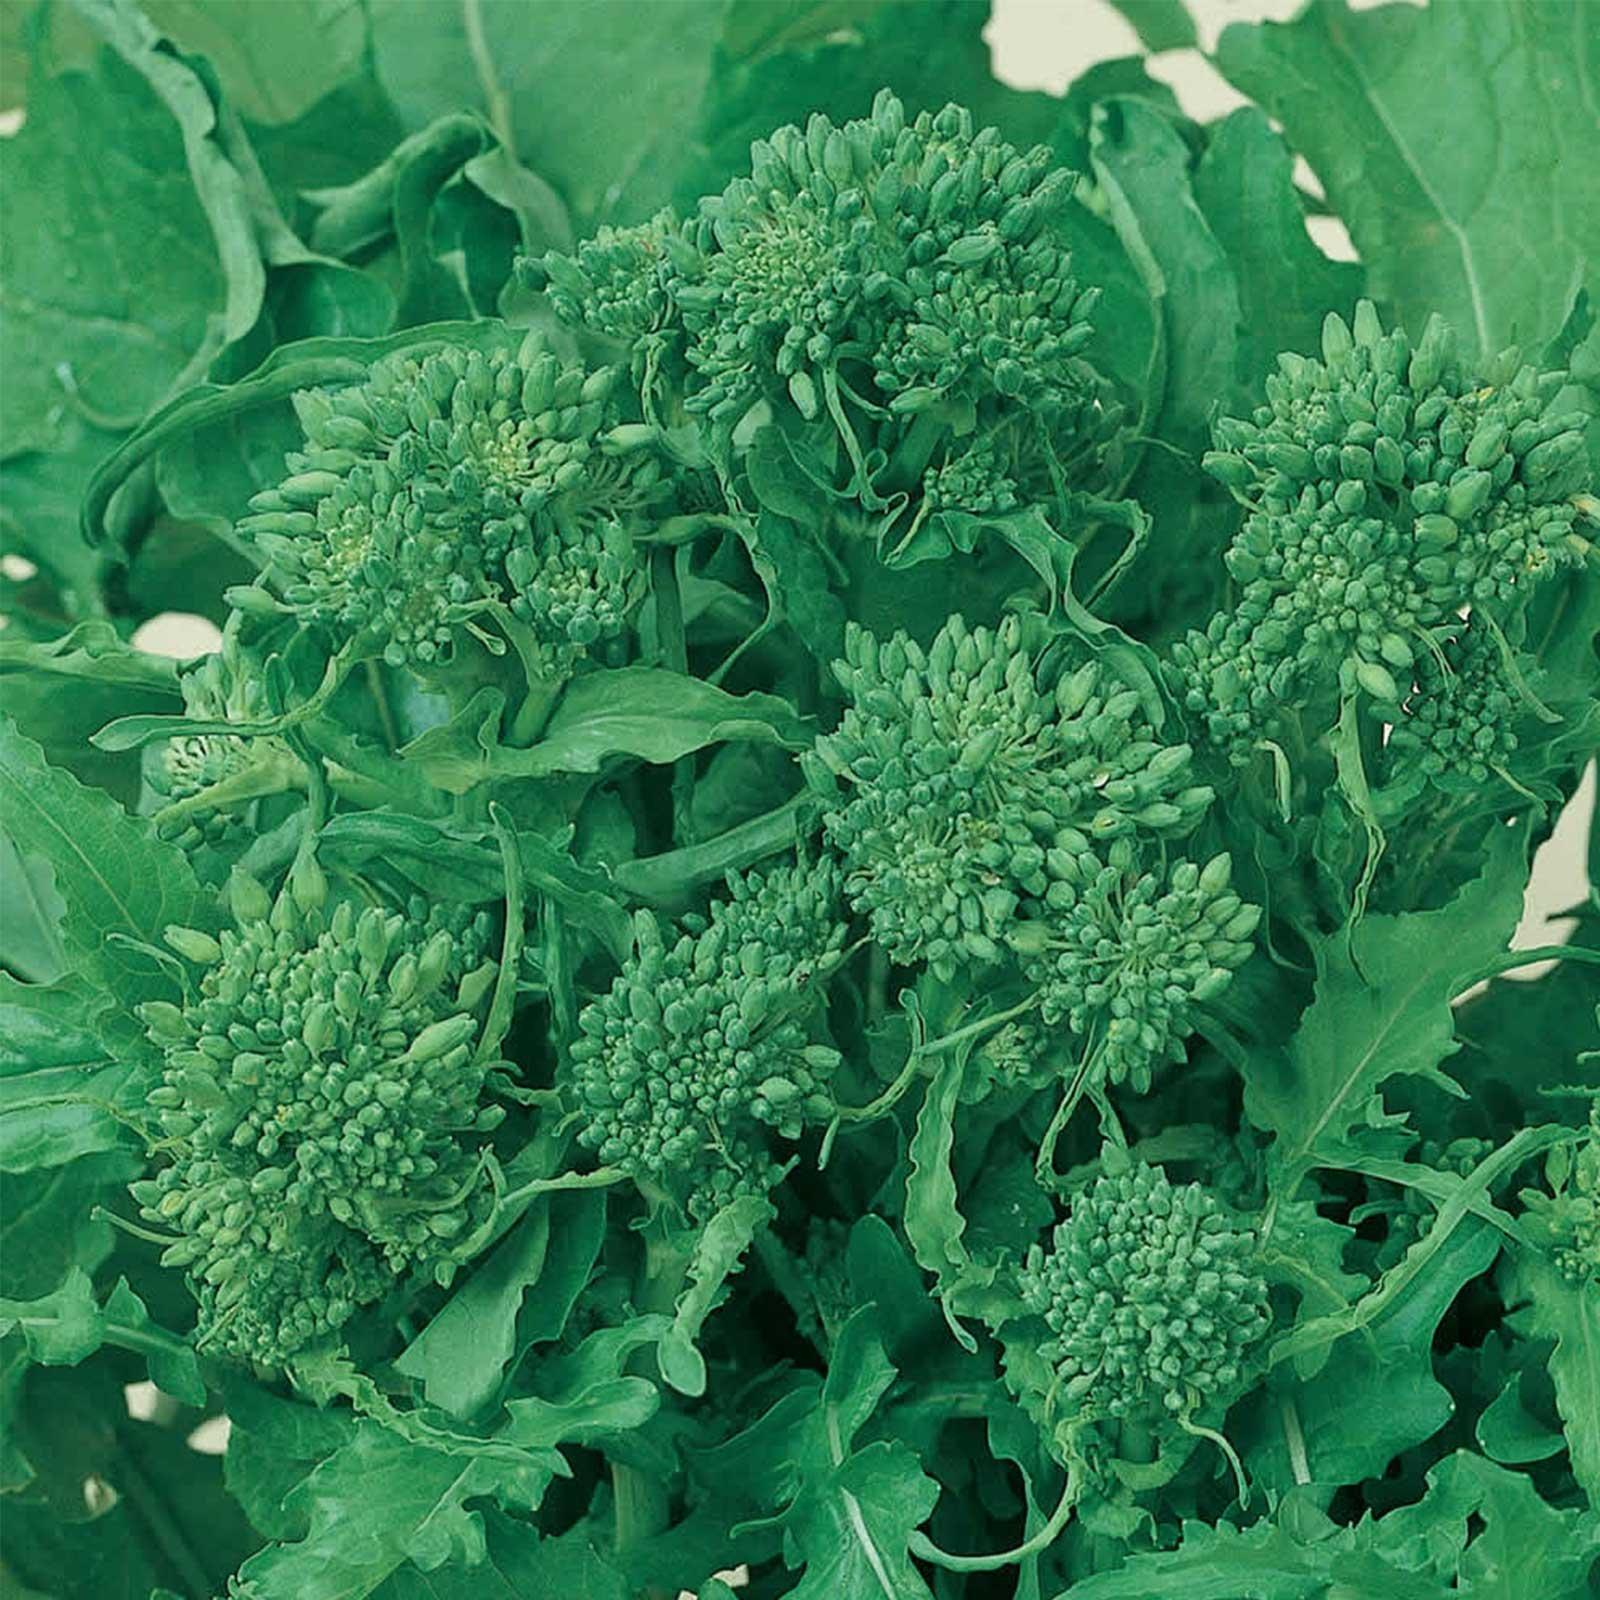 Broccoli Raab Seeds - Spring Rapini - 5 Lbs Bulk - Organic, Non-GMO, Heirloom - Vegetable Garden, Microgreens by Mountain Valley Seed Company